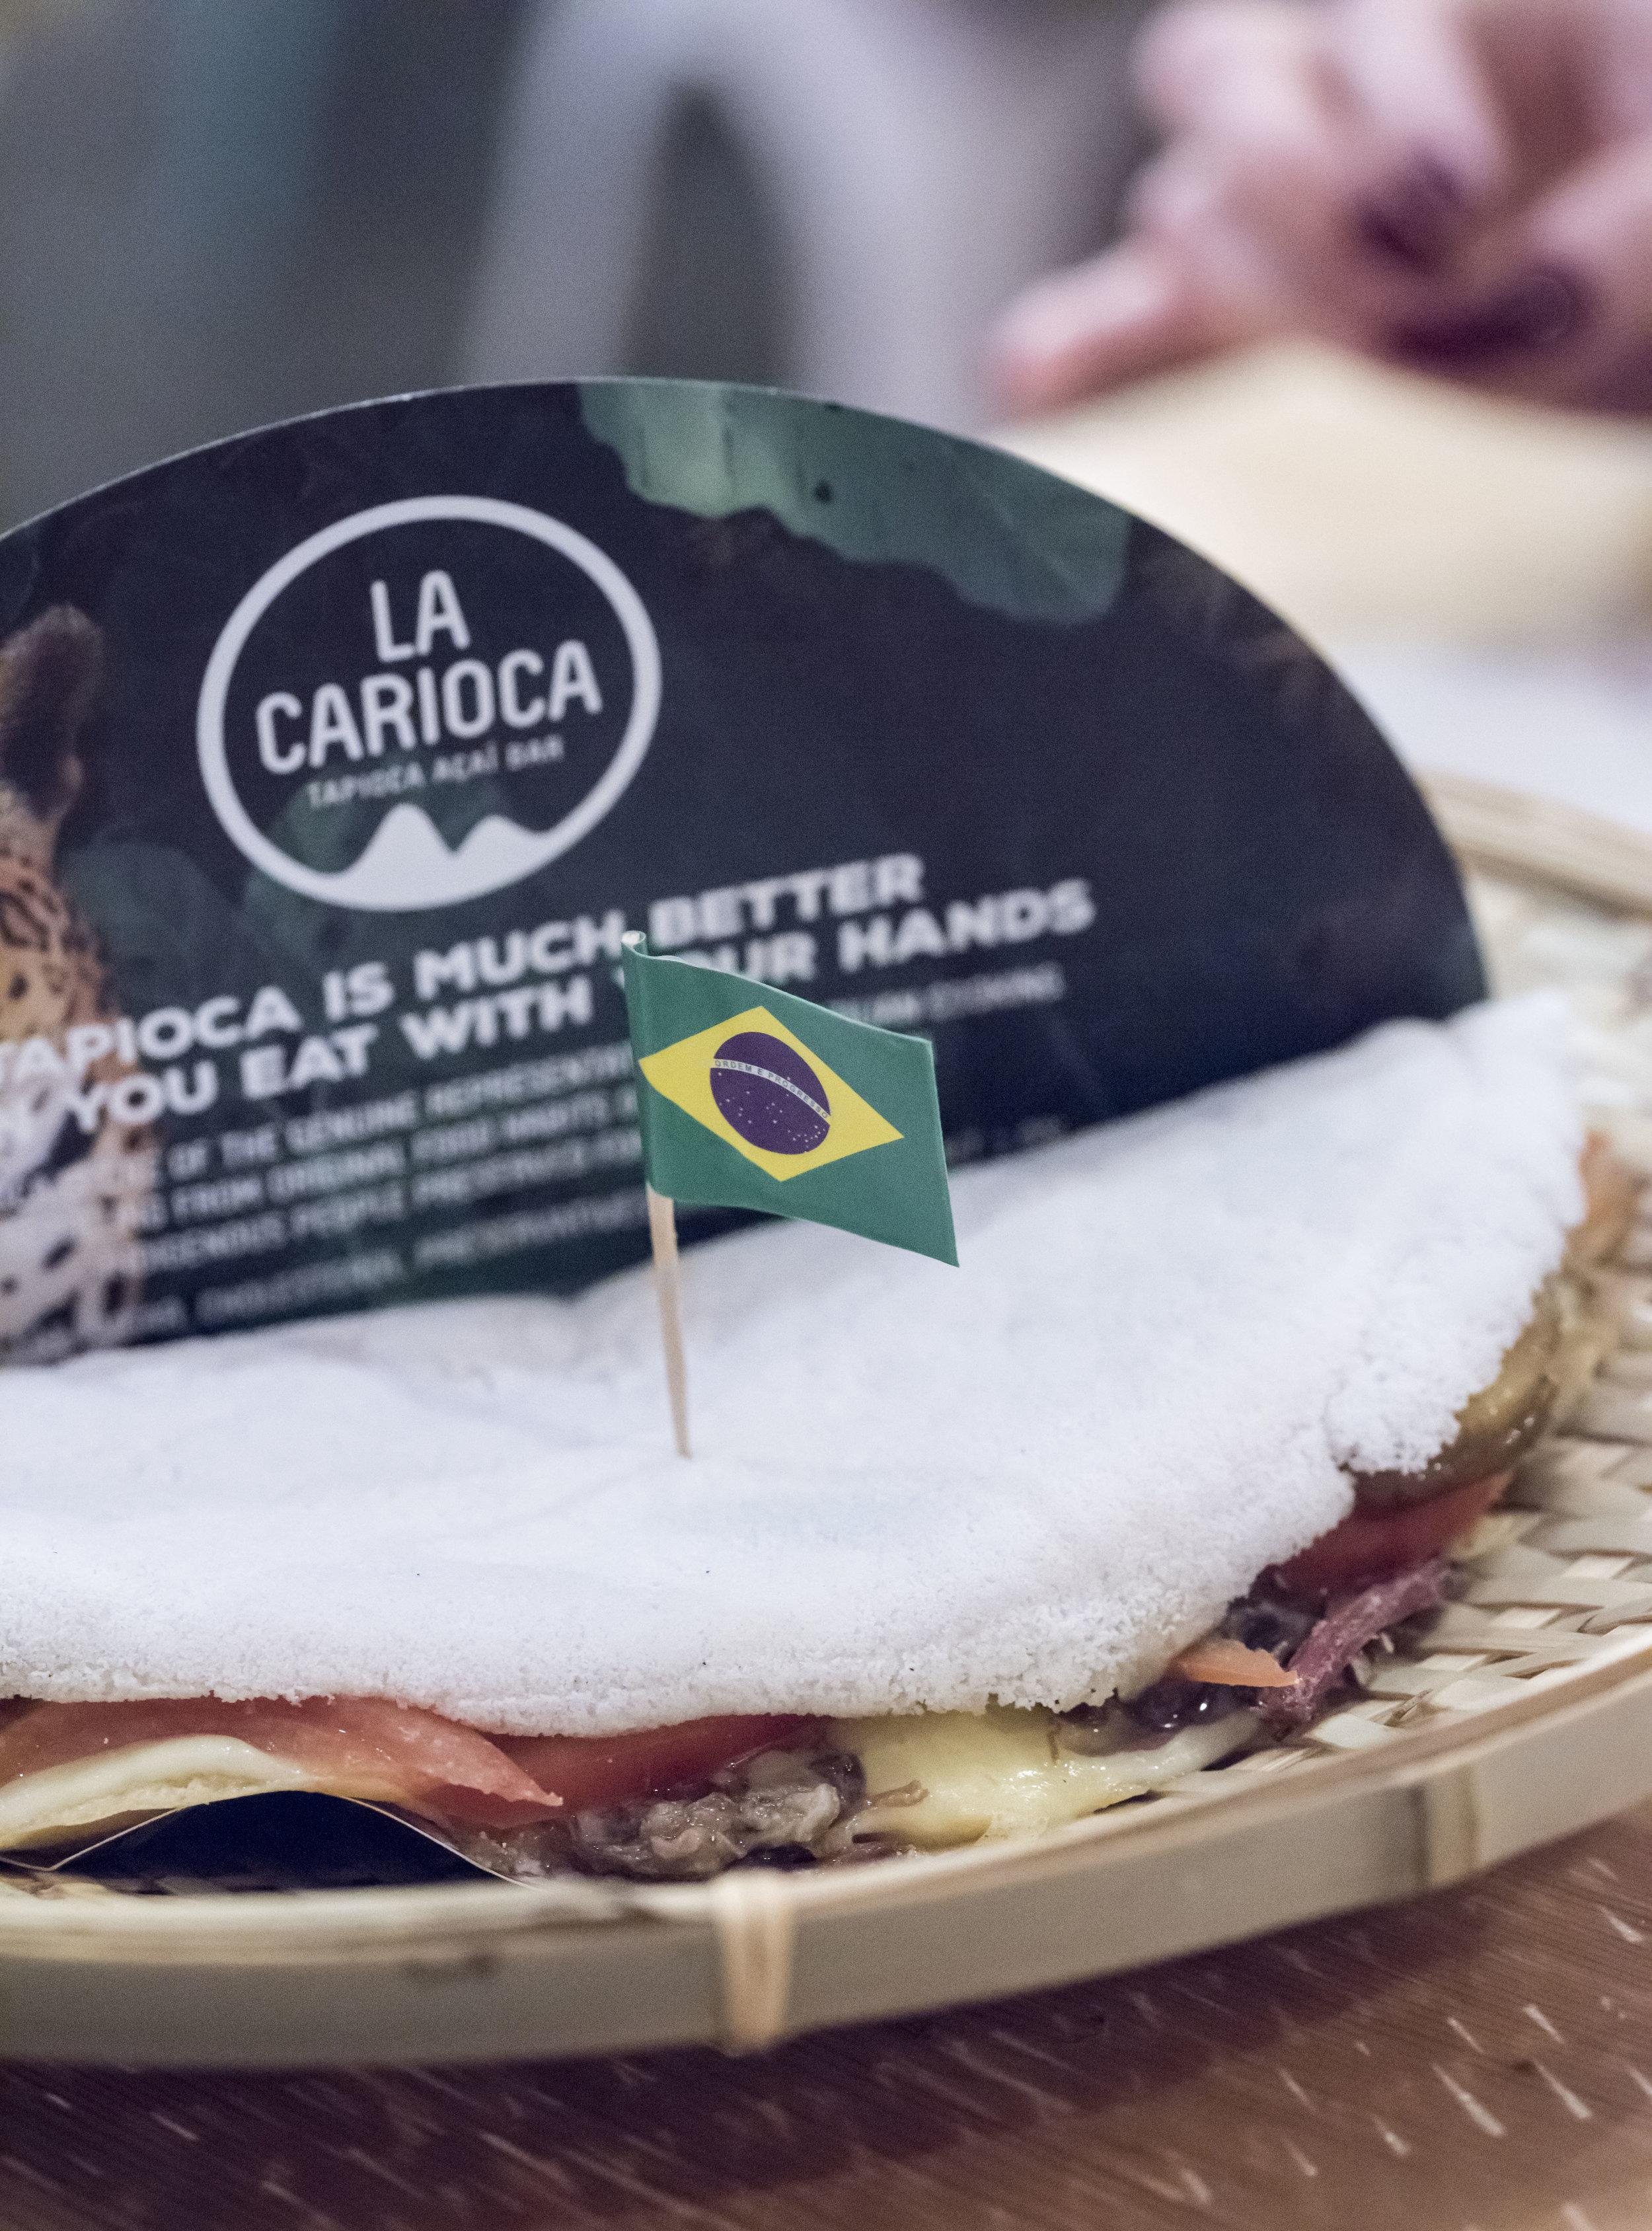 Filled tapioca at La Carioca, Barcelona